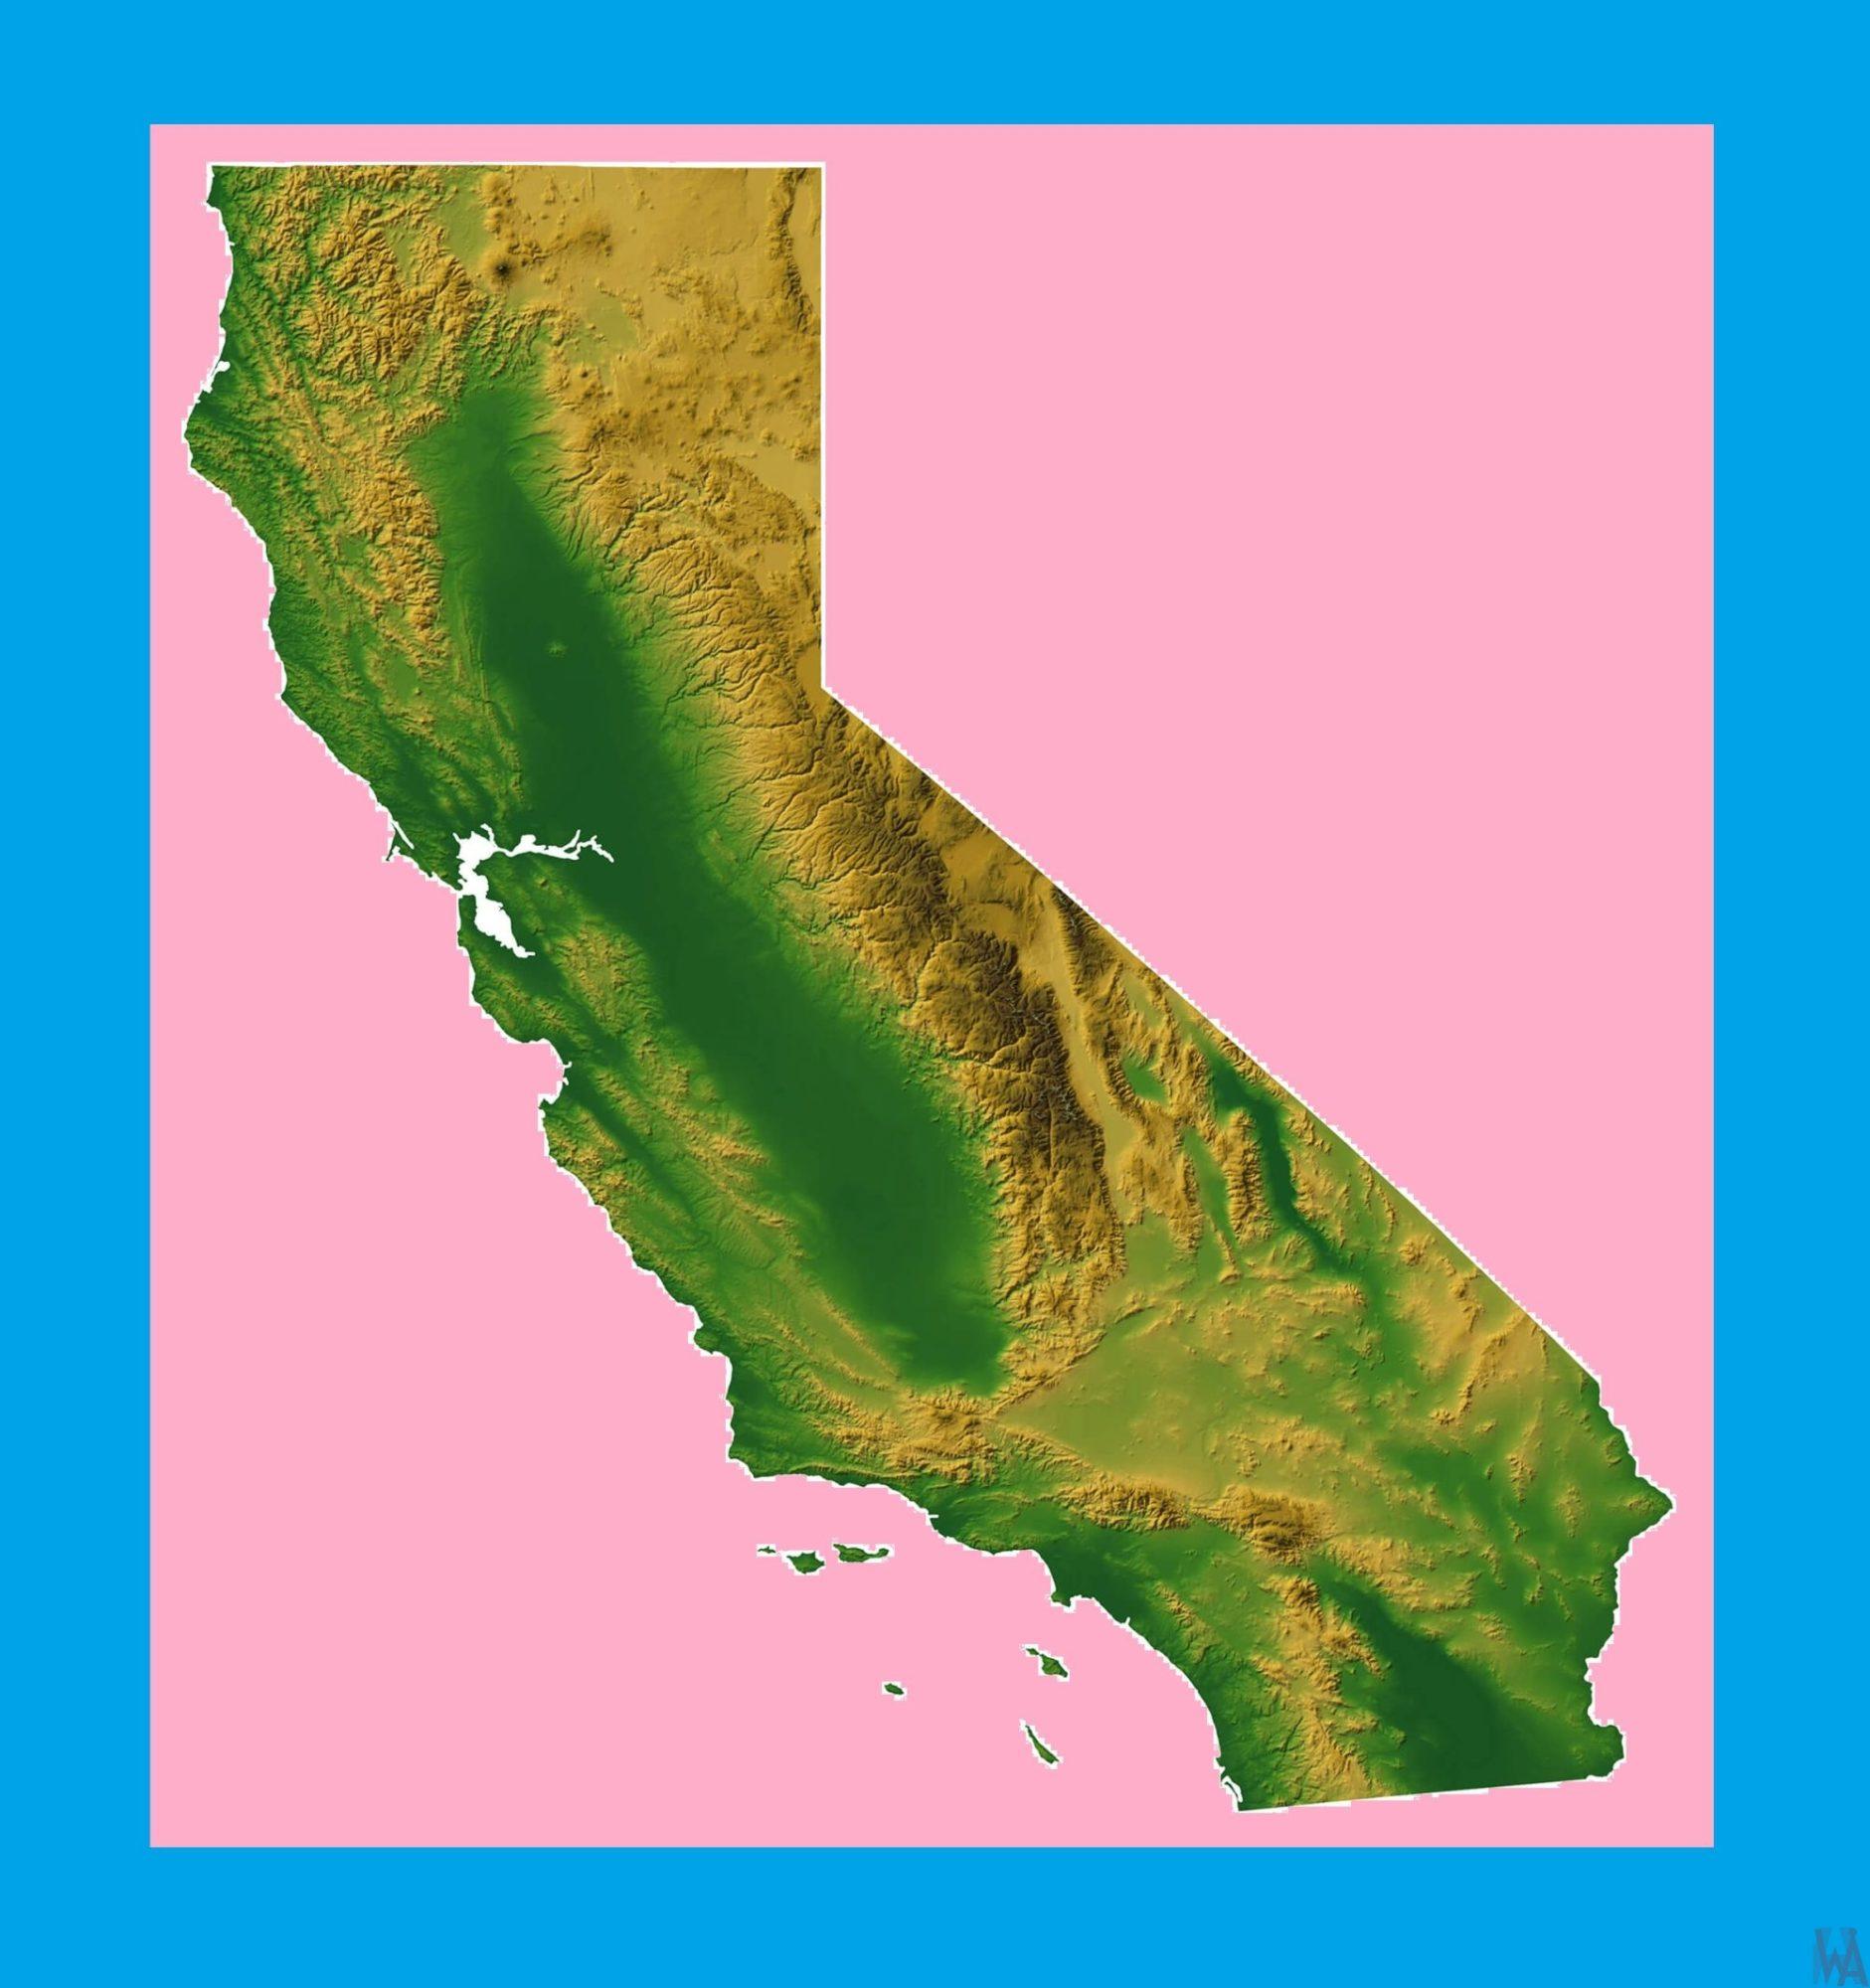 California Physical Map – 2 | Physical Map of California | WhatsAnswer